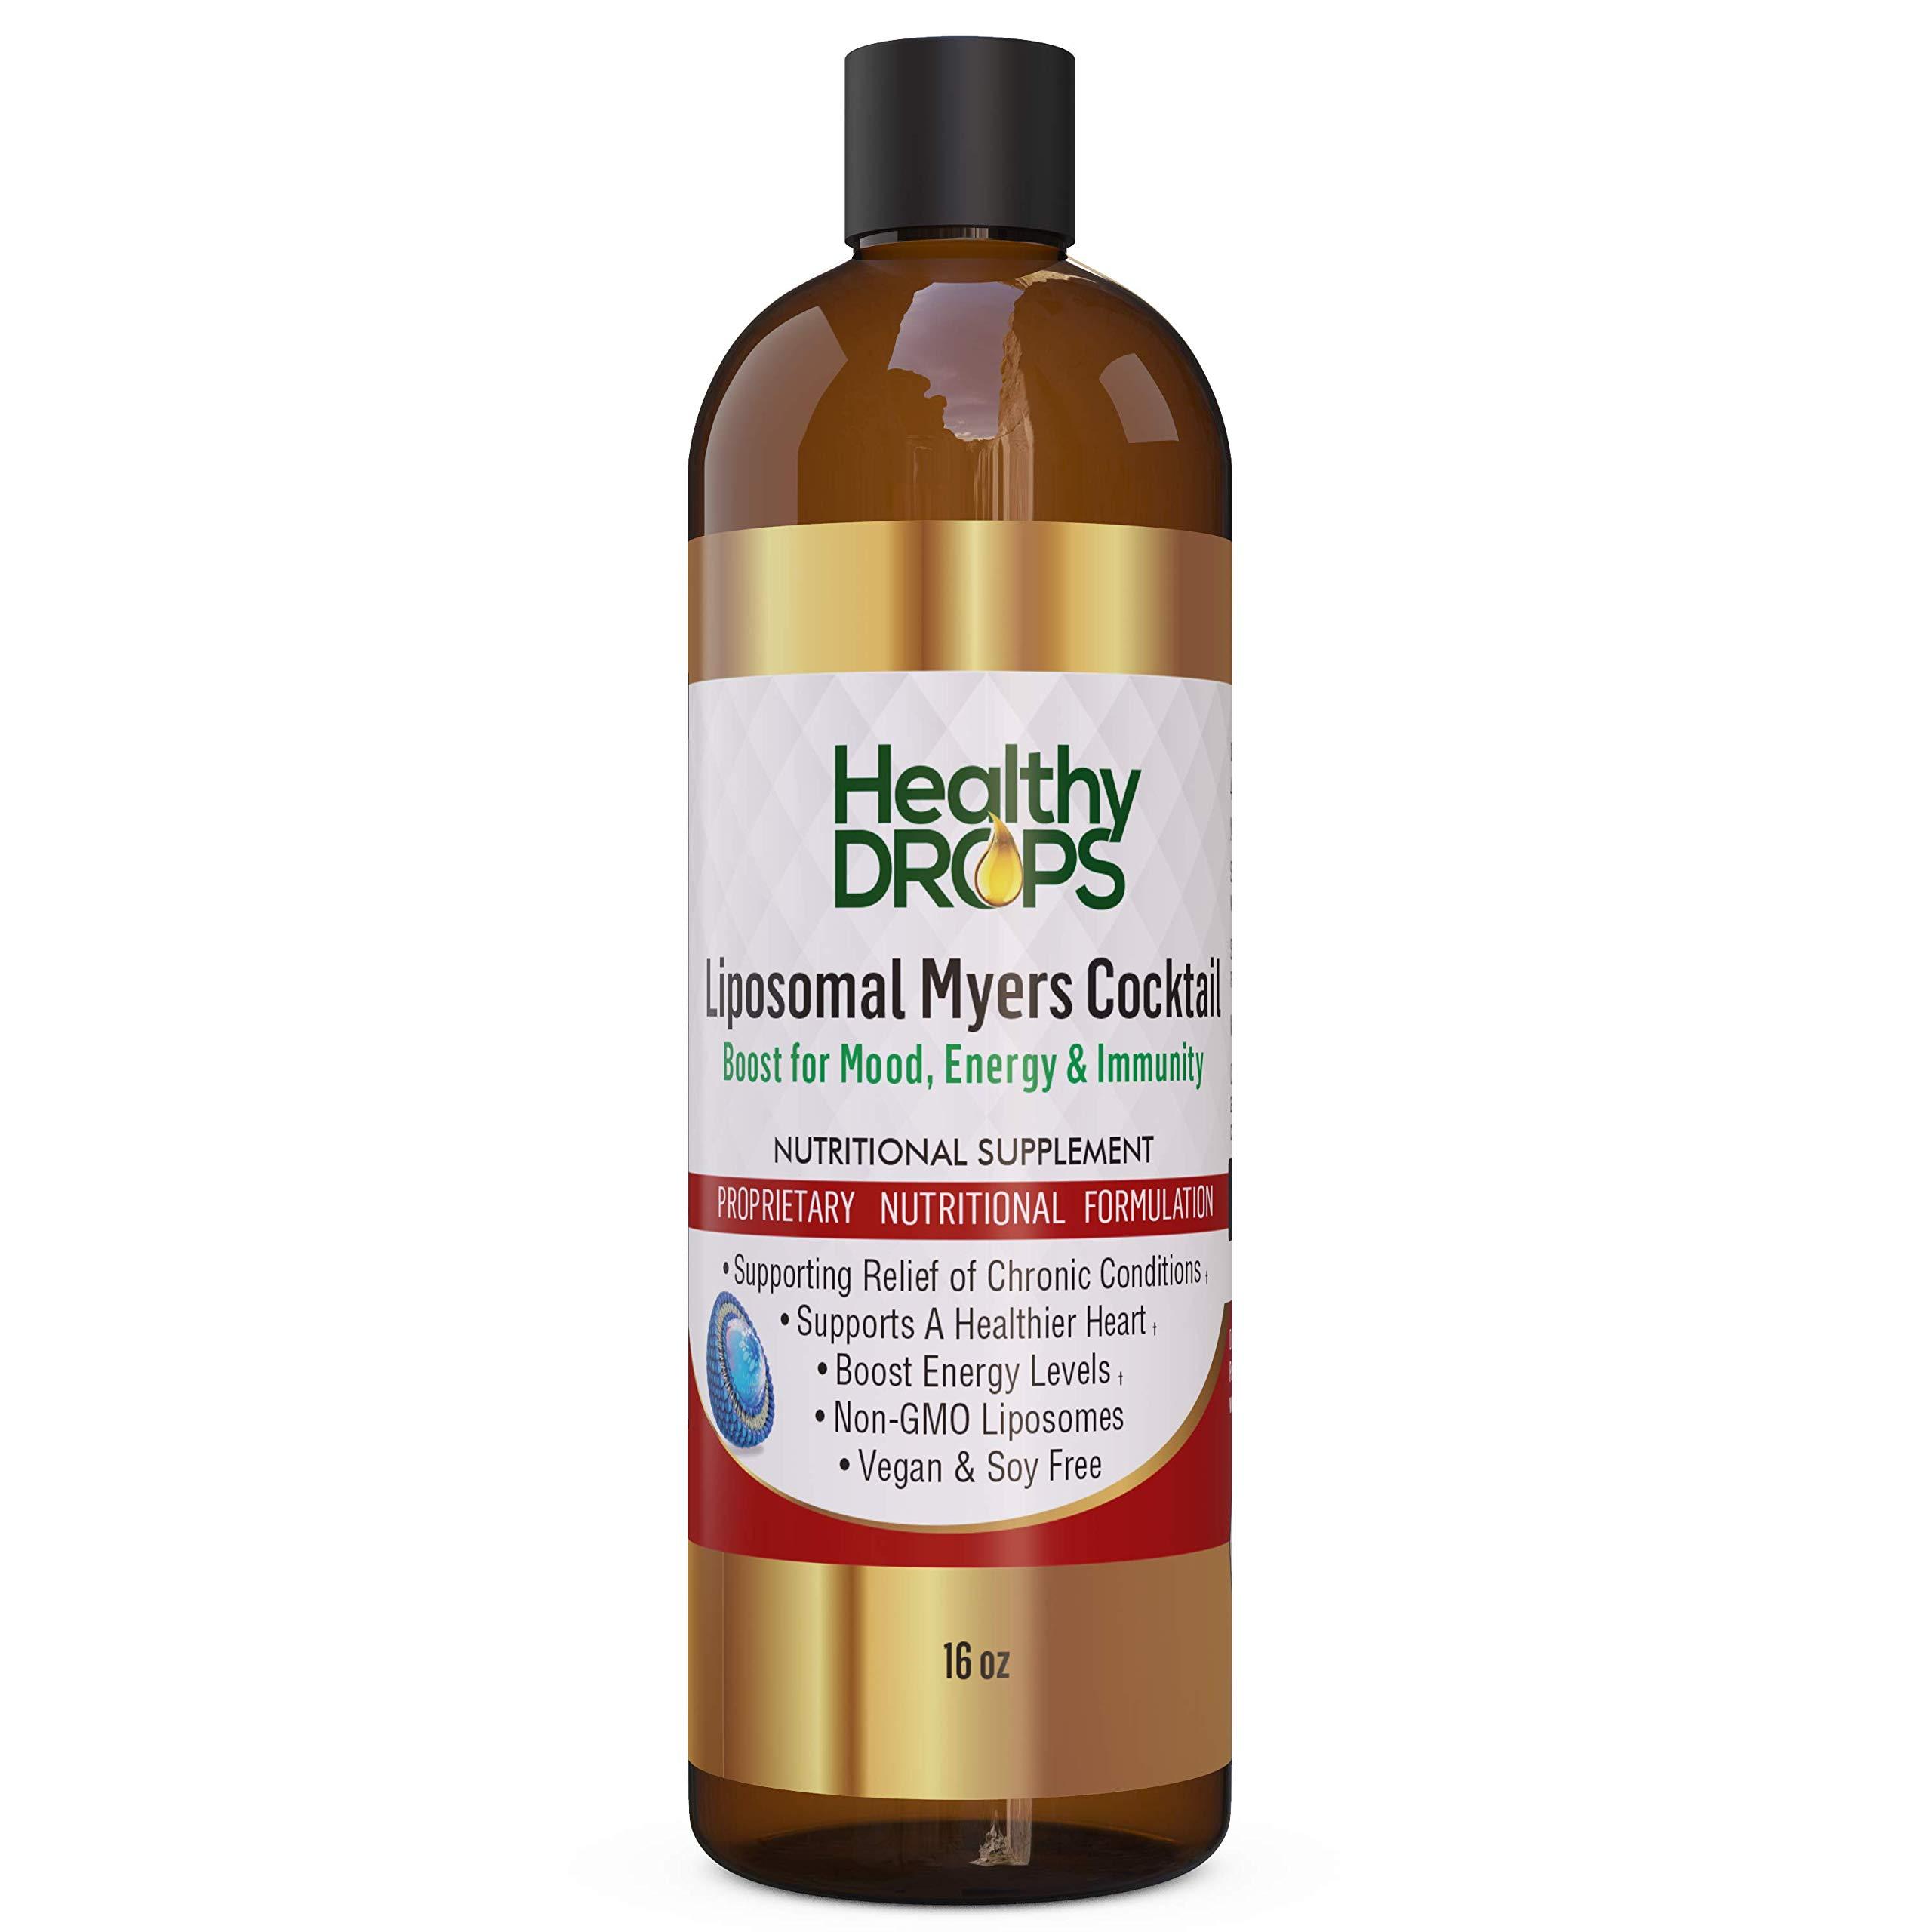 Liposomal Myers Cocktail Non-GMO Non-Soy 16 oz Rejuvenating Liquid Multivitamin Supplement Restores Energy Levels - Providing The Highest bio-Availability